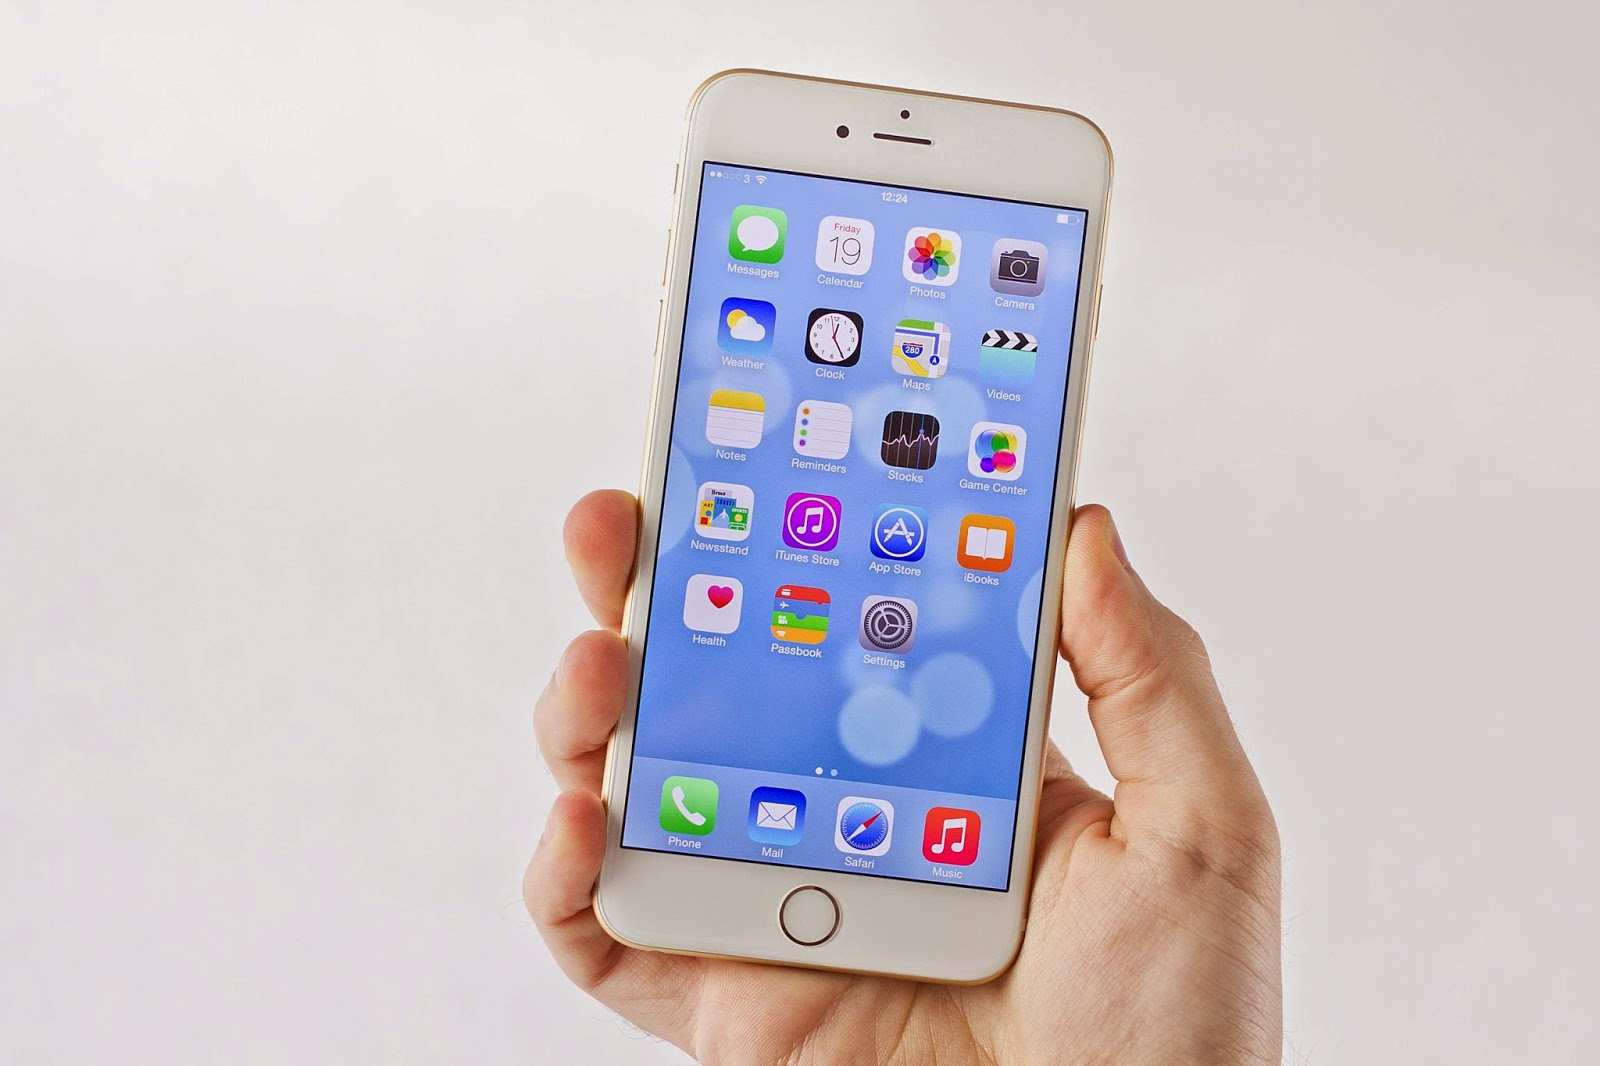 iPhone 6 Datang, iPhone Lawas Belum Hilang